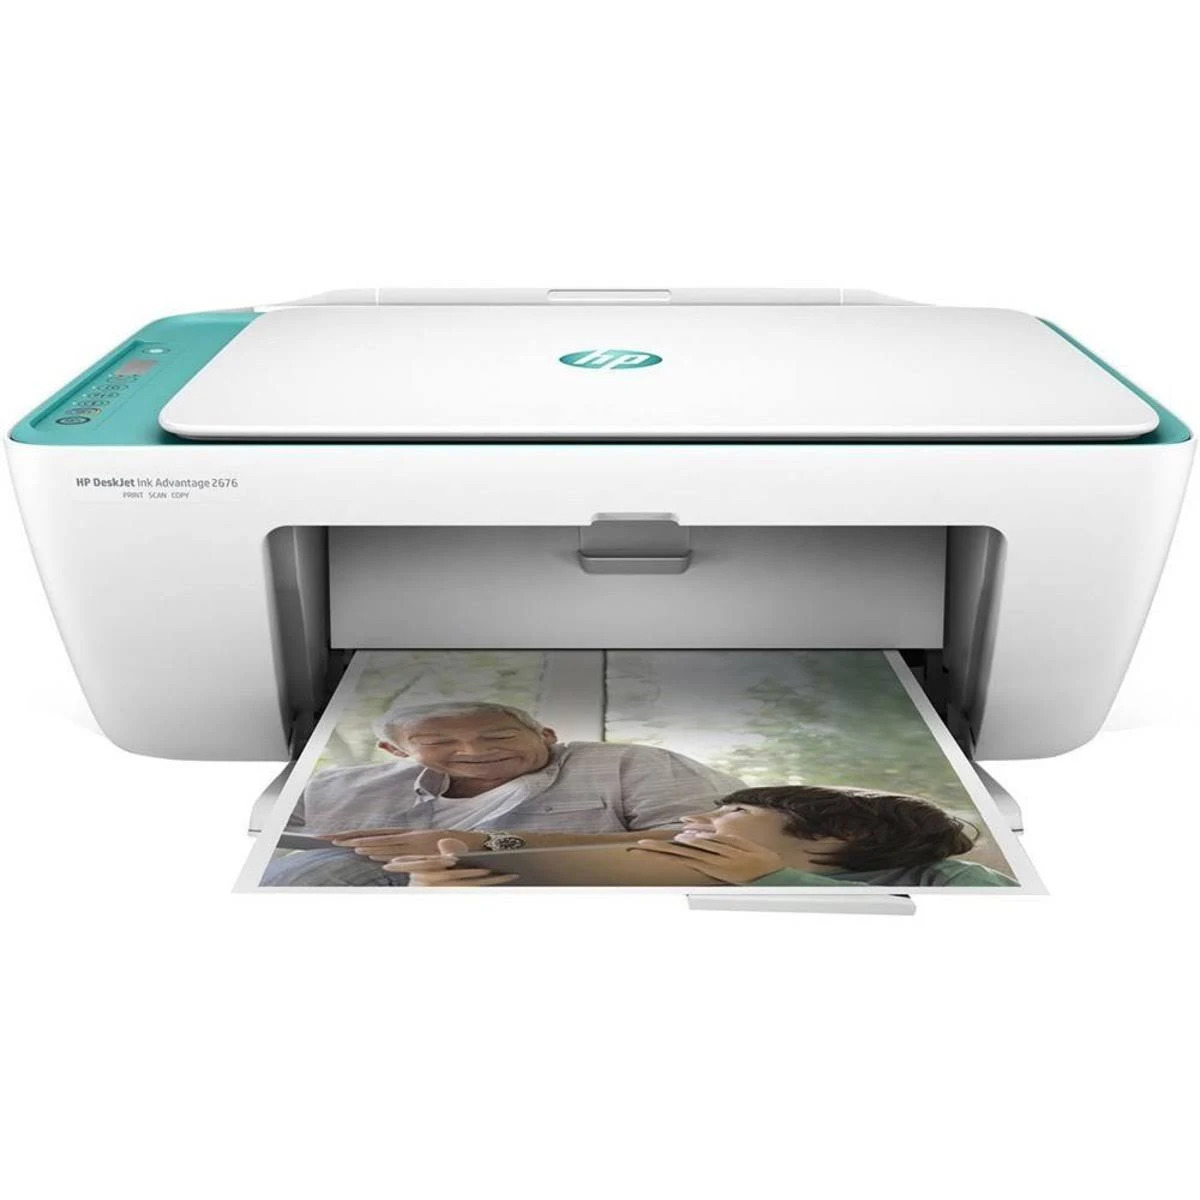 Impressora Multifuncional HP Deskjet Ink Advantage 2676 Colorida Wireless